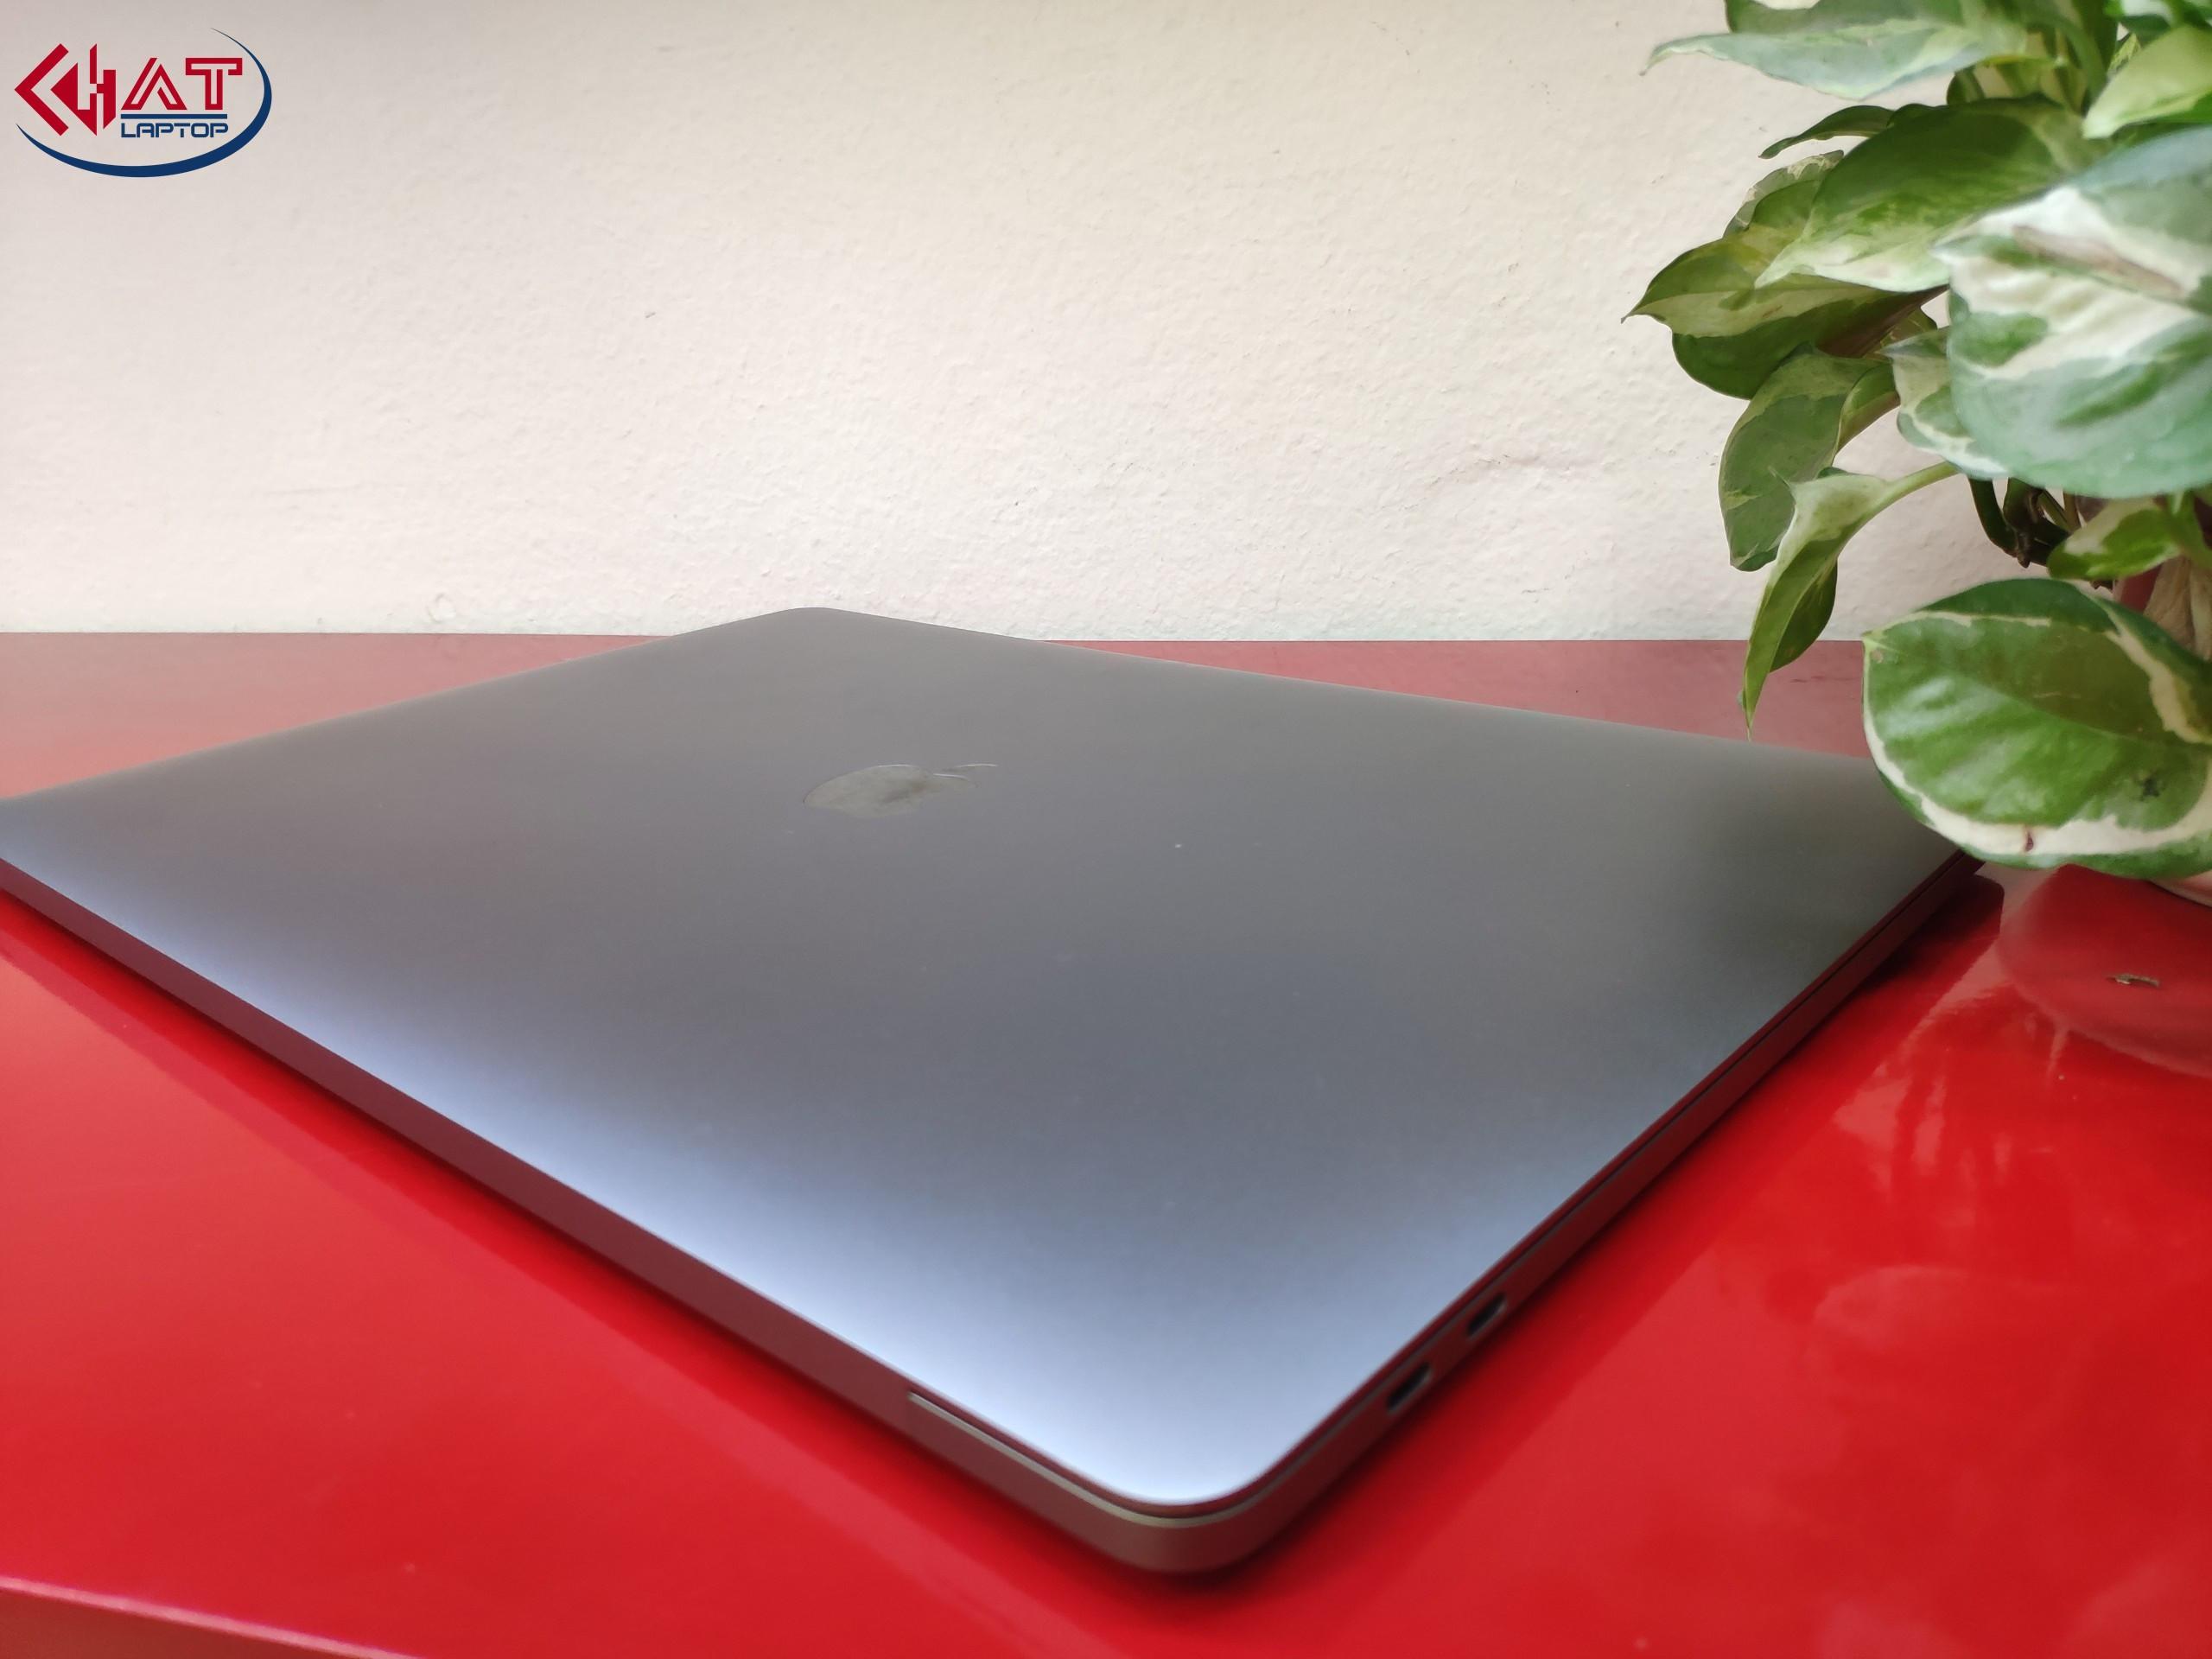 MacBook Pro 15 2016 (MLH42) i7 2.9 GHz/ Ram 16G/ SSD 1T/ AMD 460